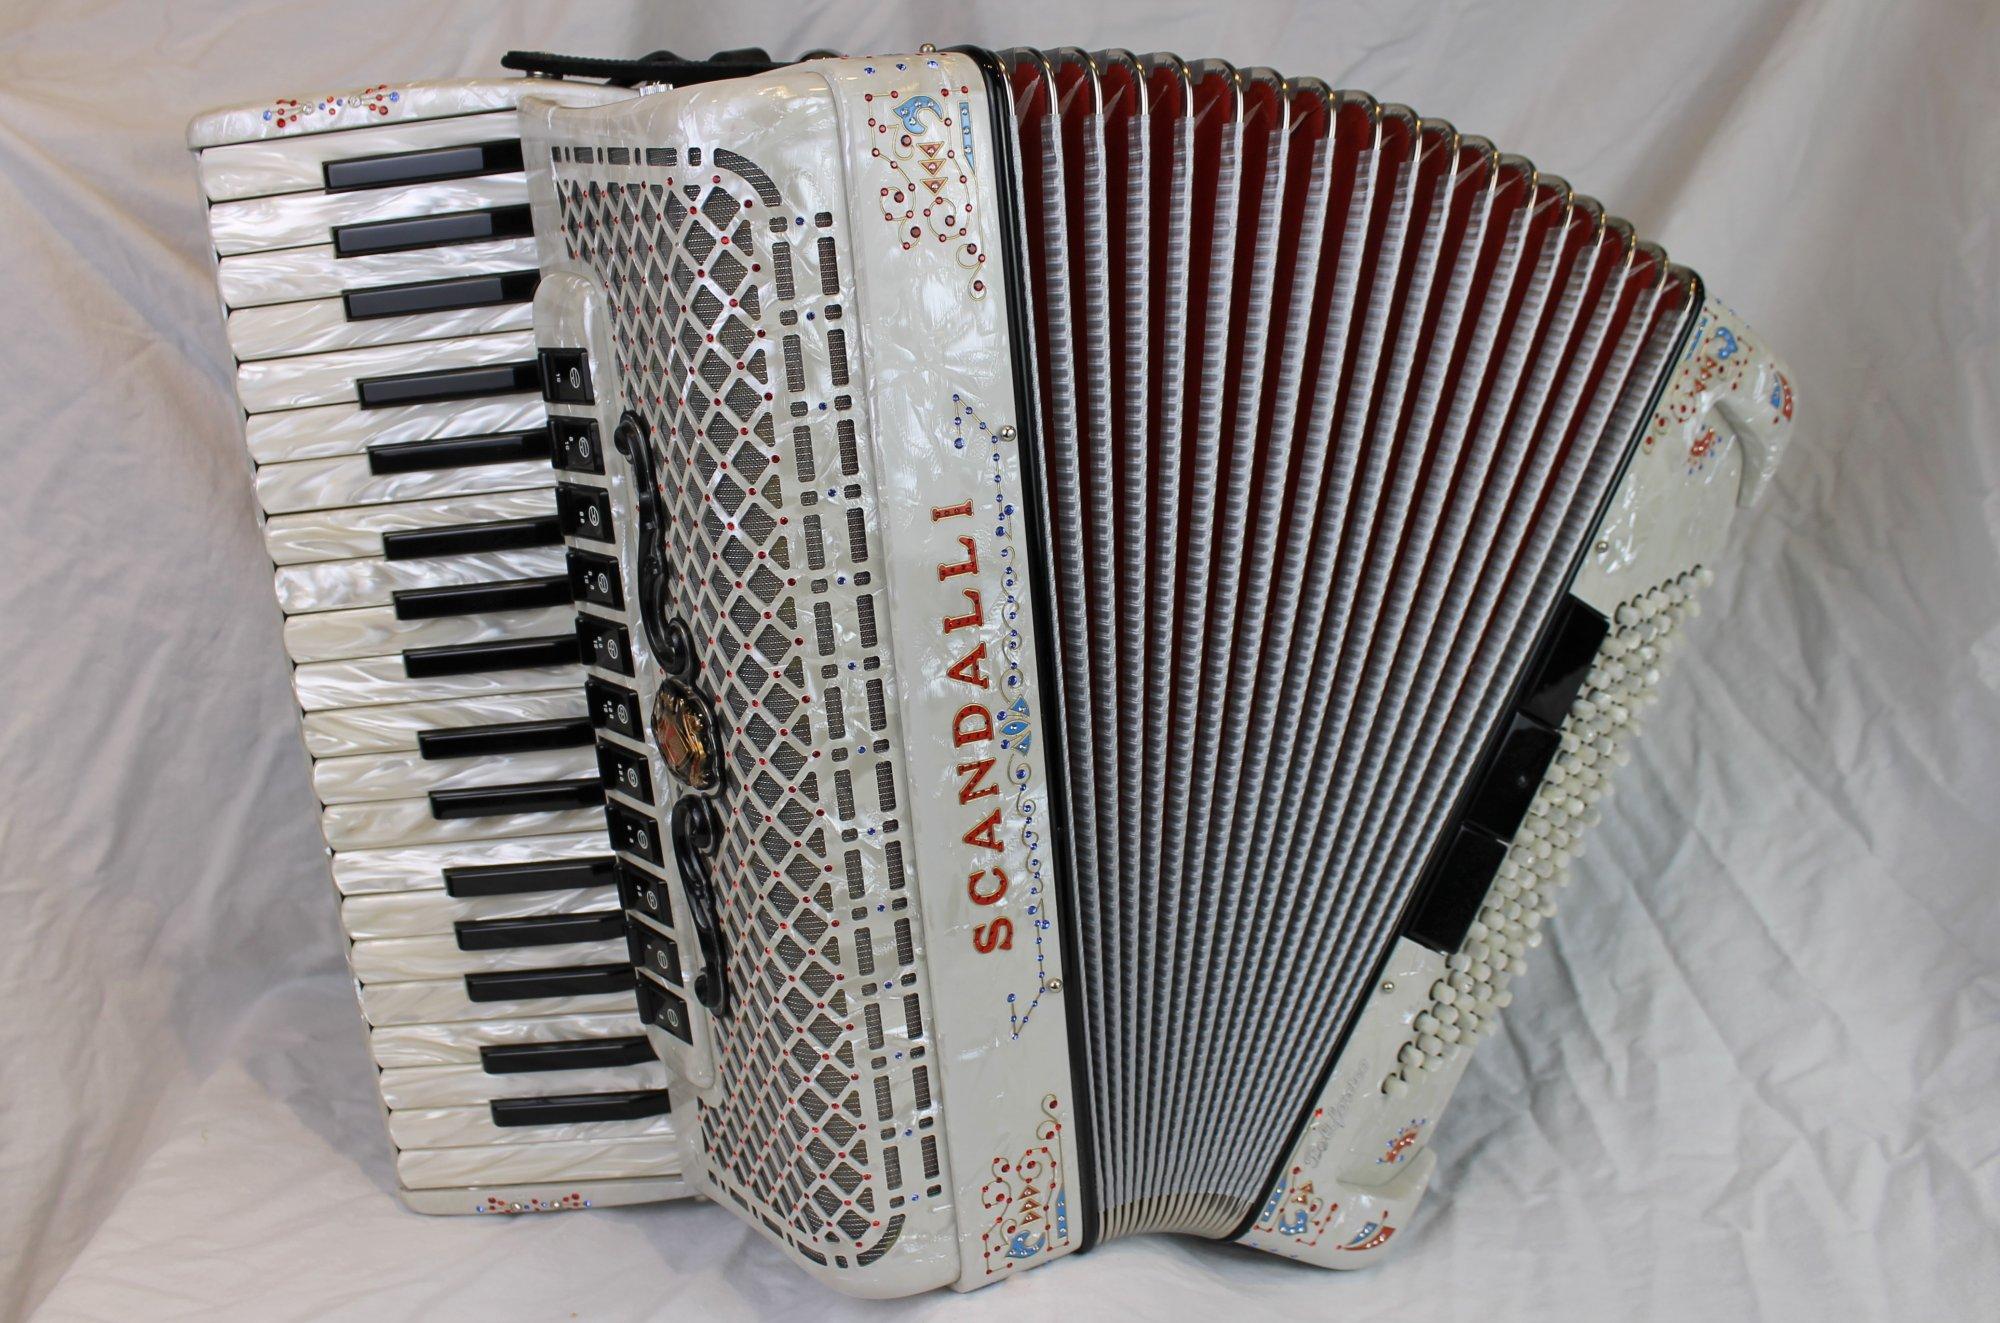 NEW White Decorated Scandalli Polifonico IX Piano Accordion LMMM 37 96